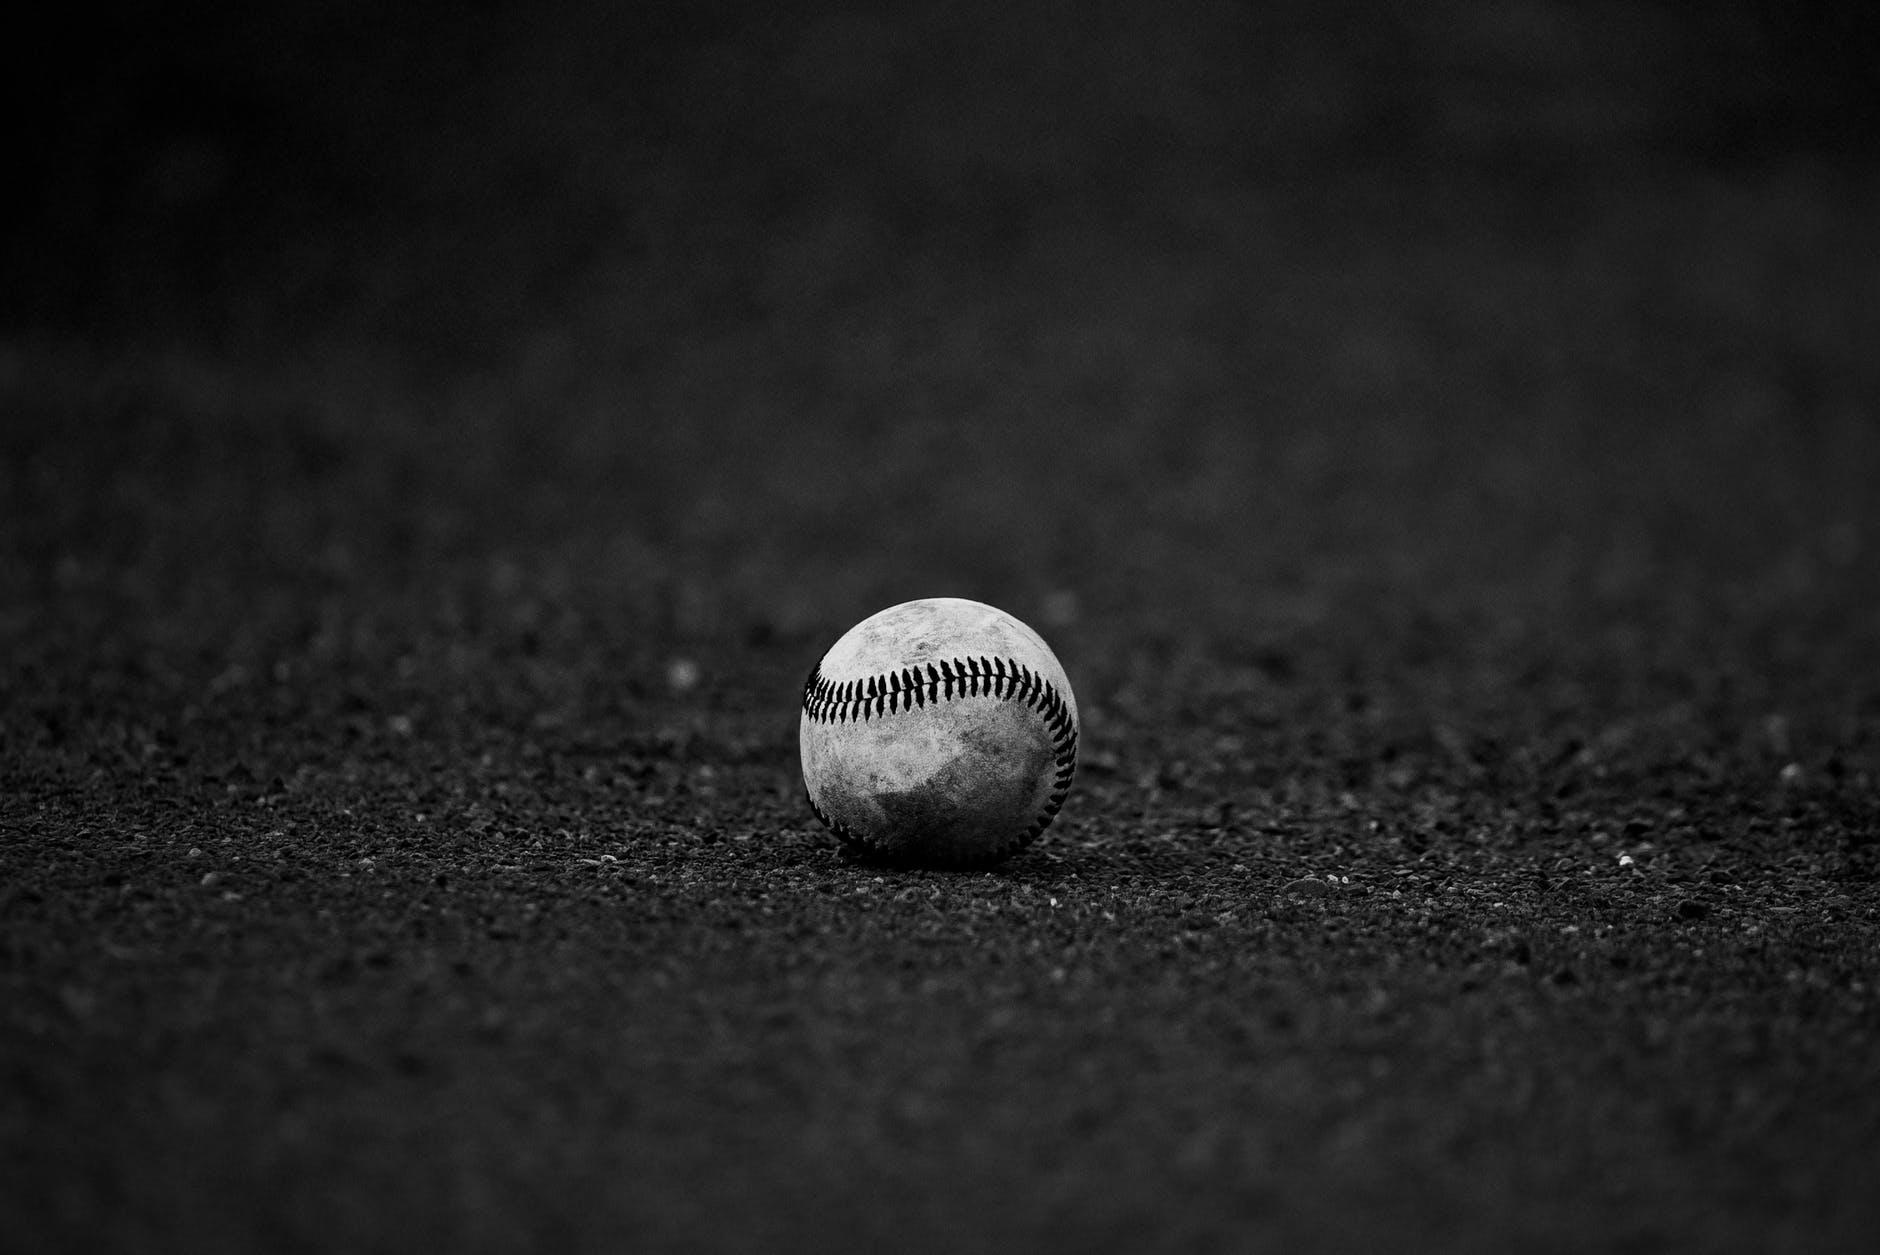 selective focus grayscale photography of baseball